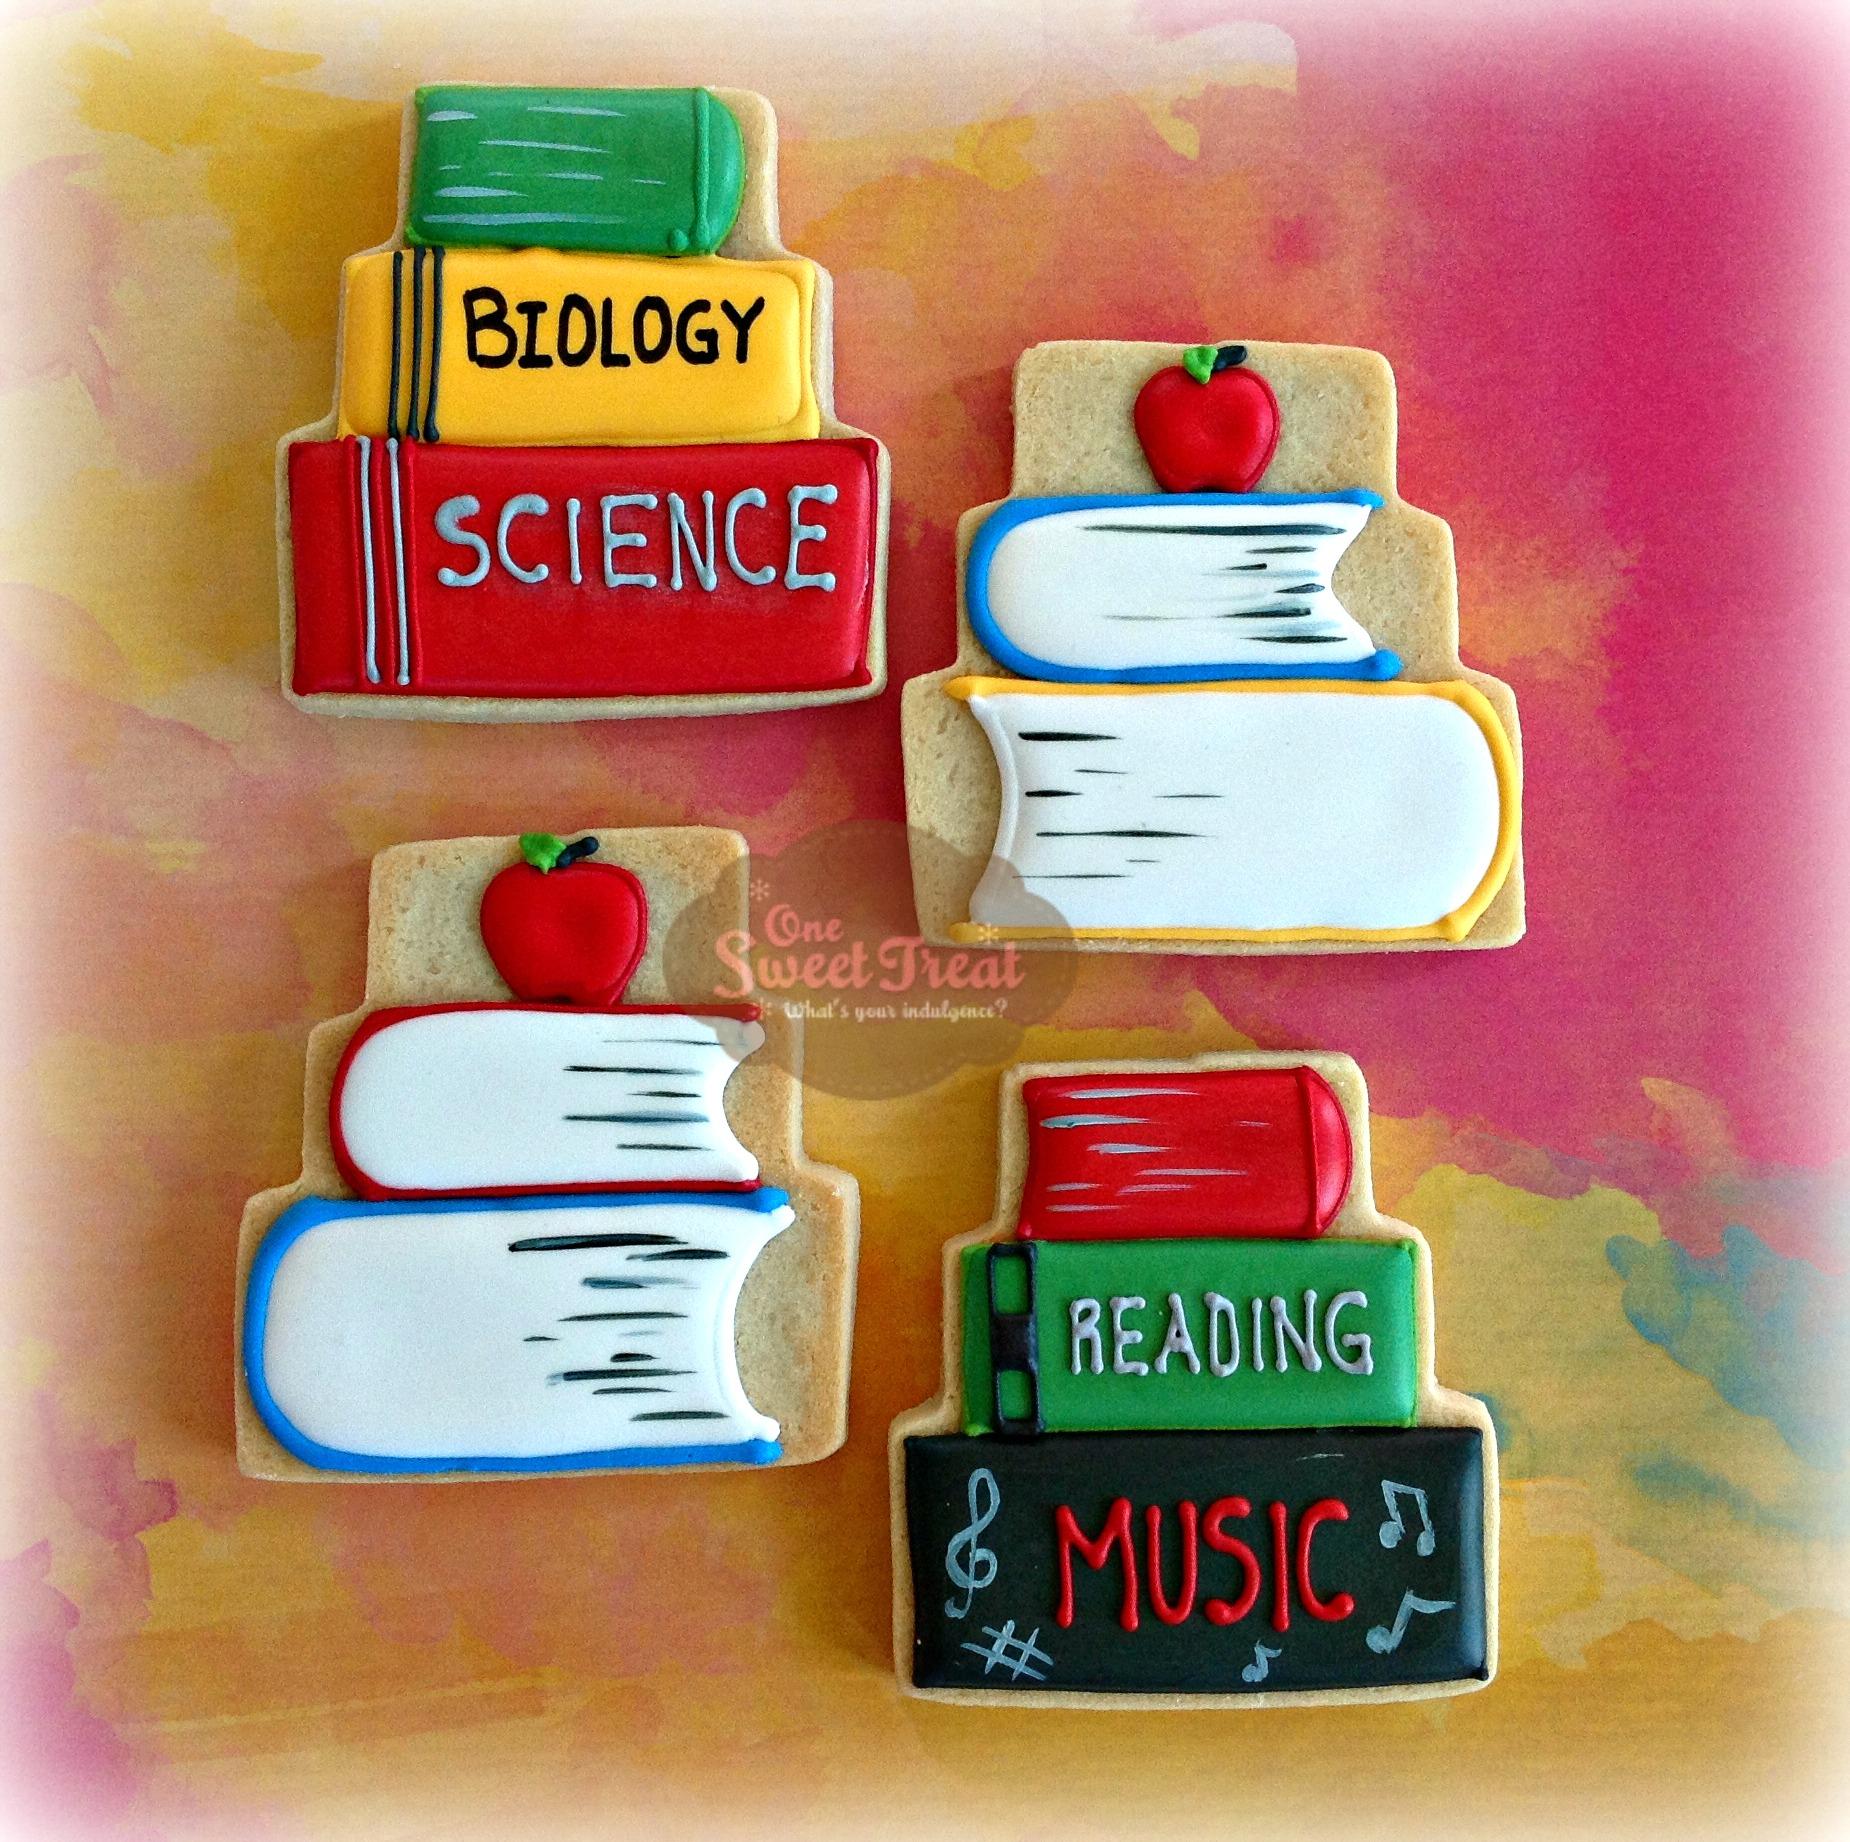 books-img_5207-1